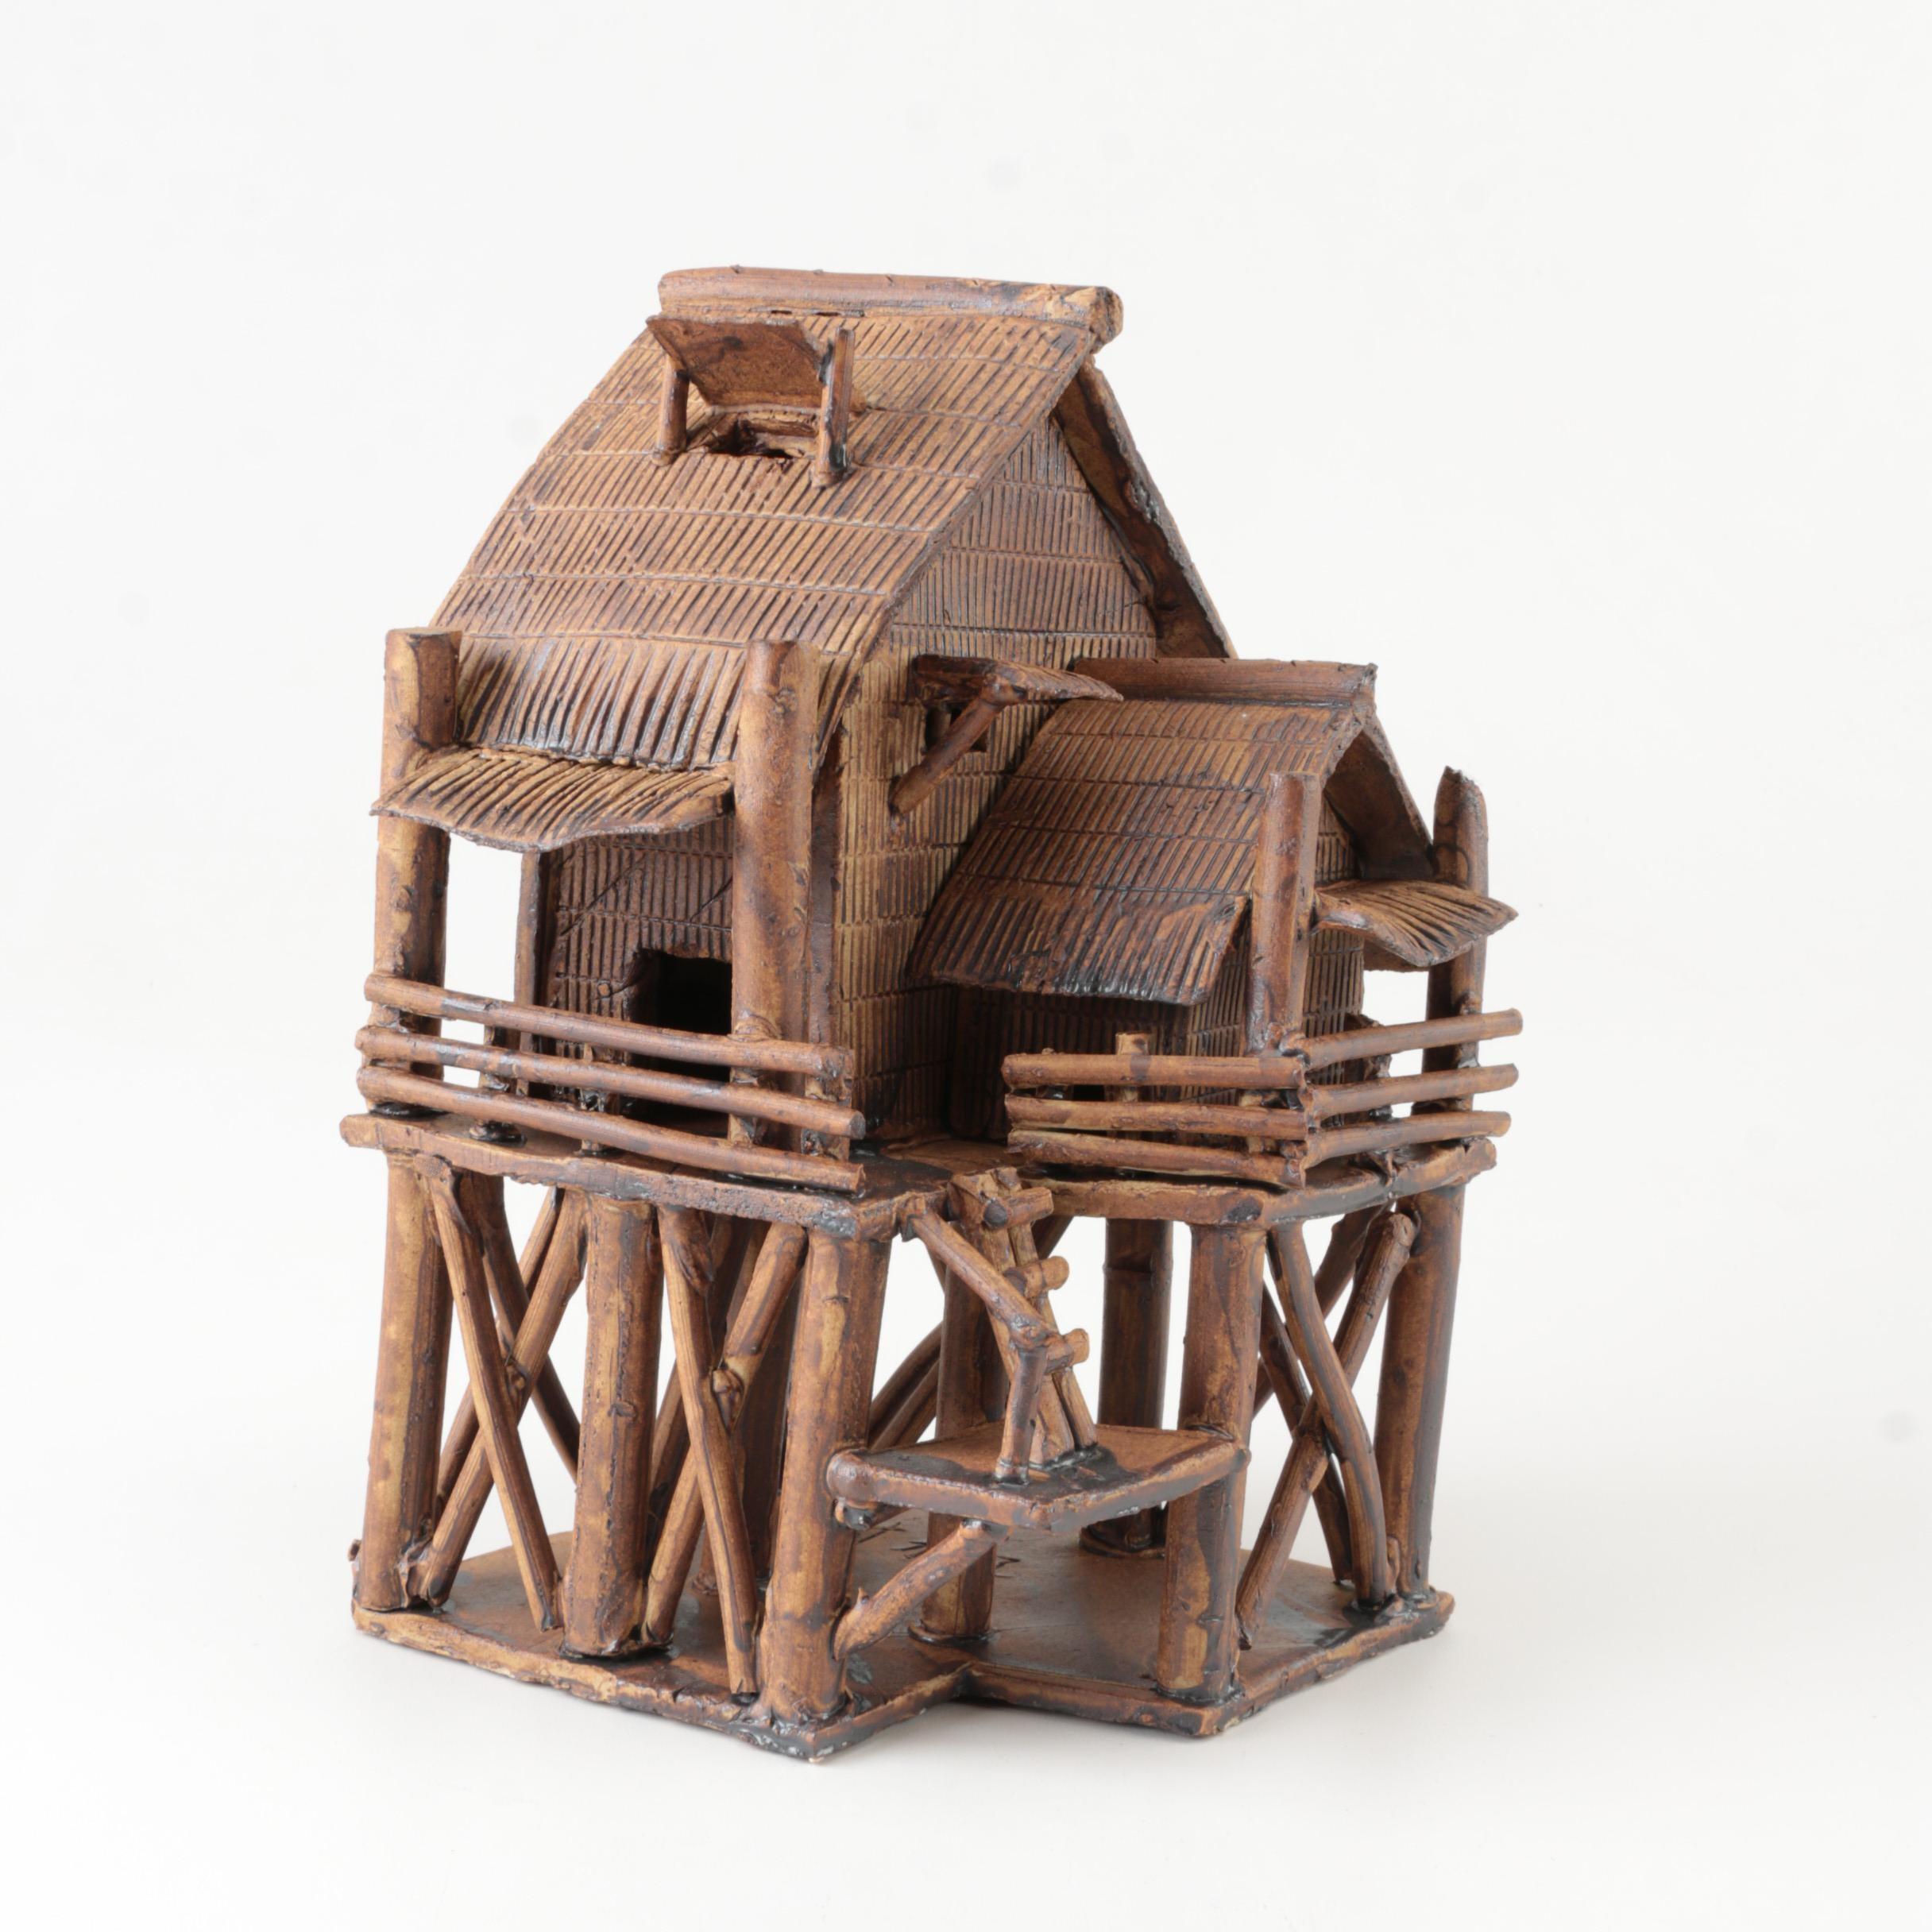 Miniature Wood Hut on Stilts